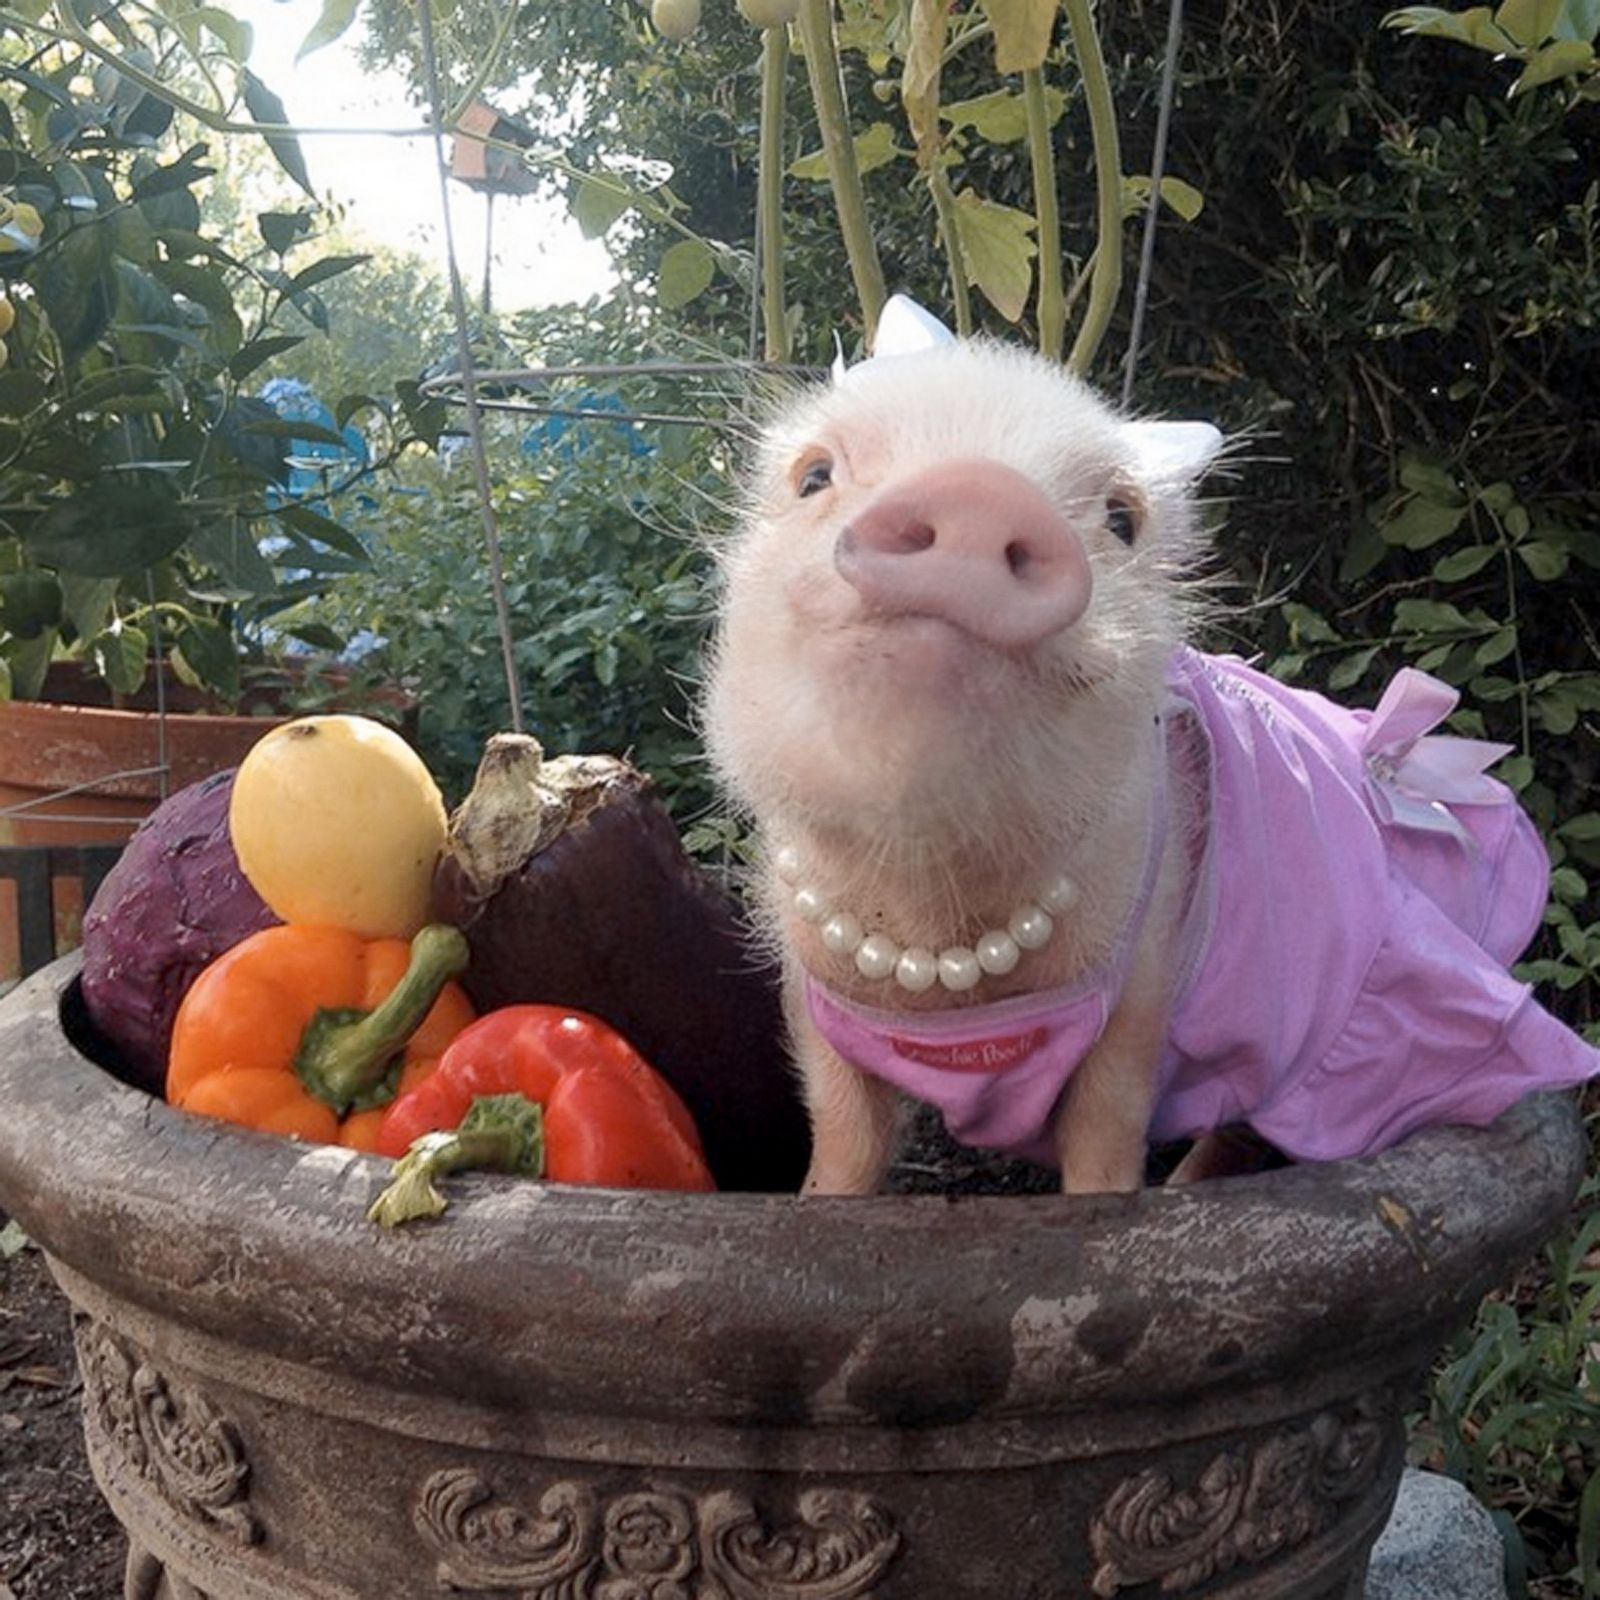 Cute Mini Pigs Play Dress-Up Photos | Image #5 - ABC News